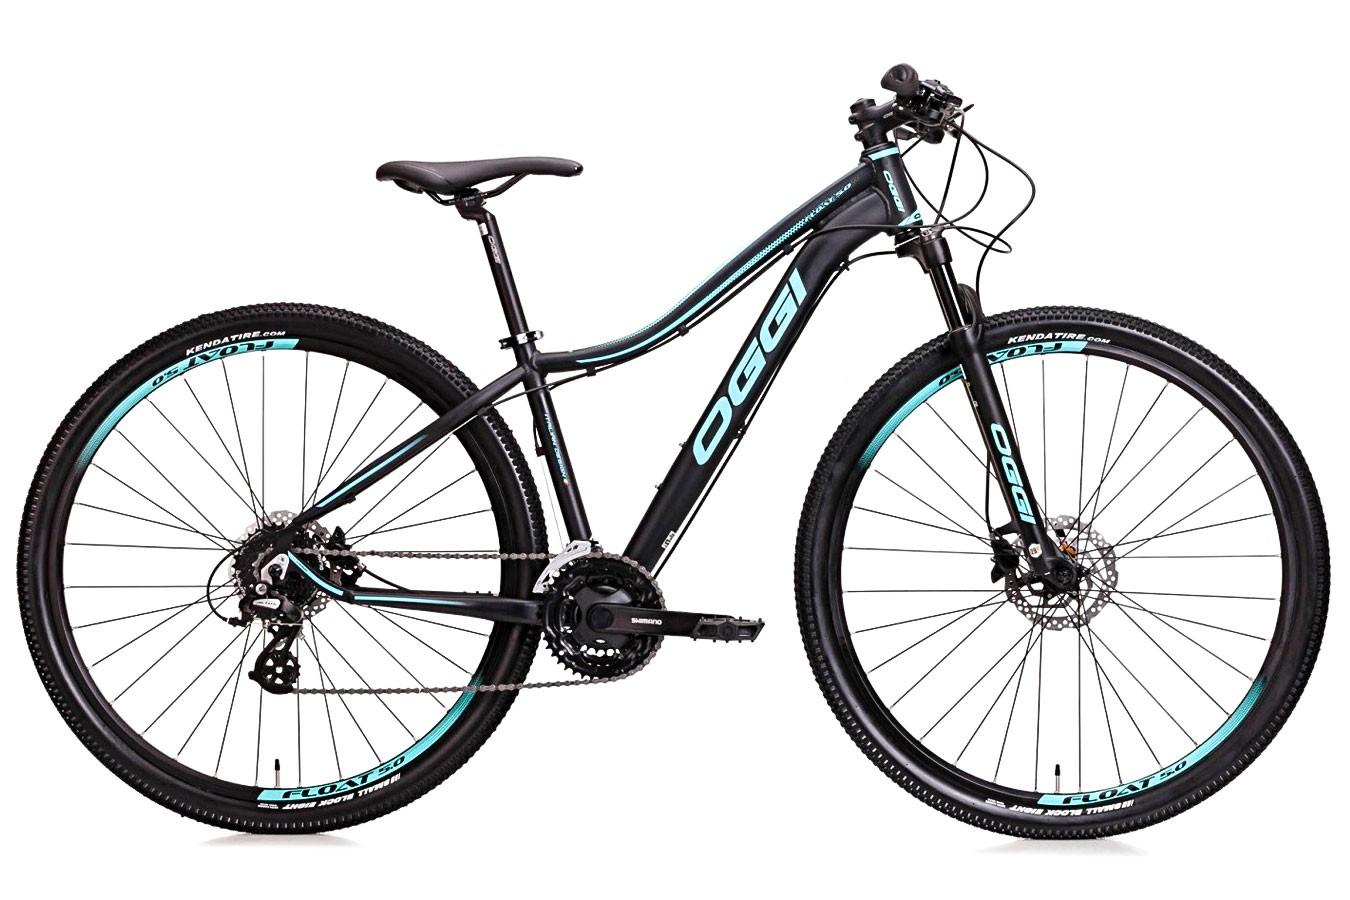 Bicicleta 29 feminina Float 5.0 24 velocidades - Oggi